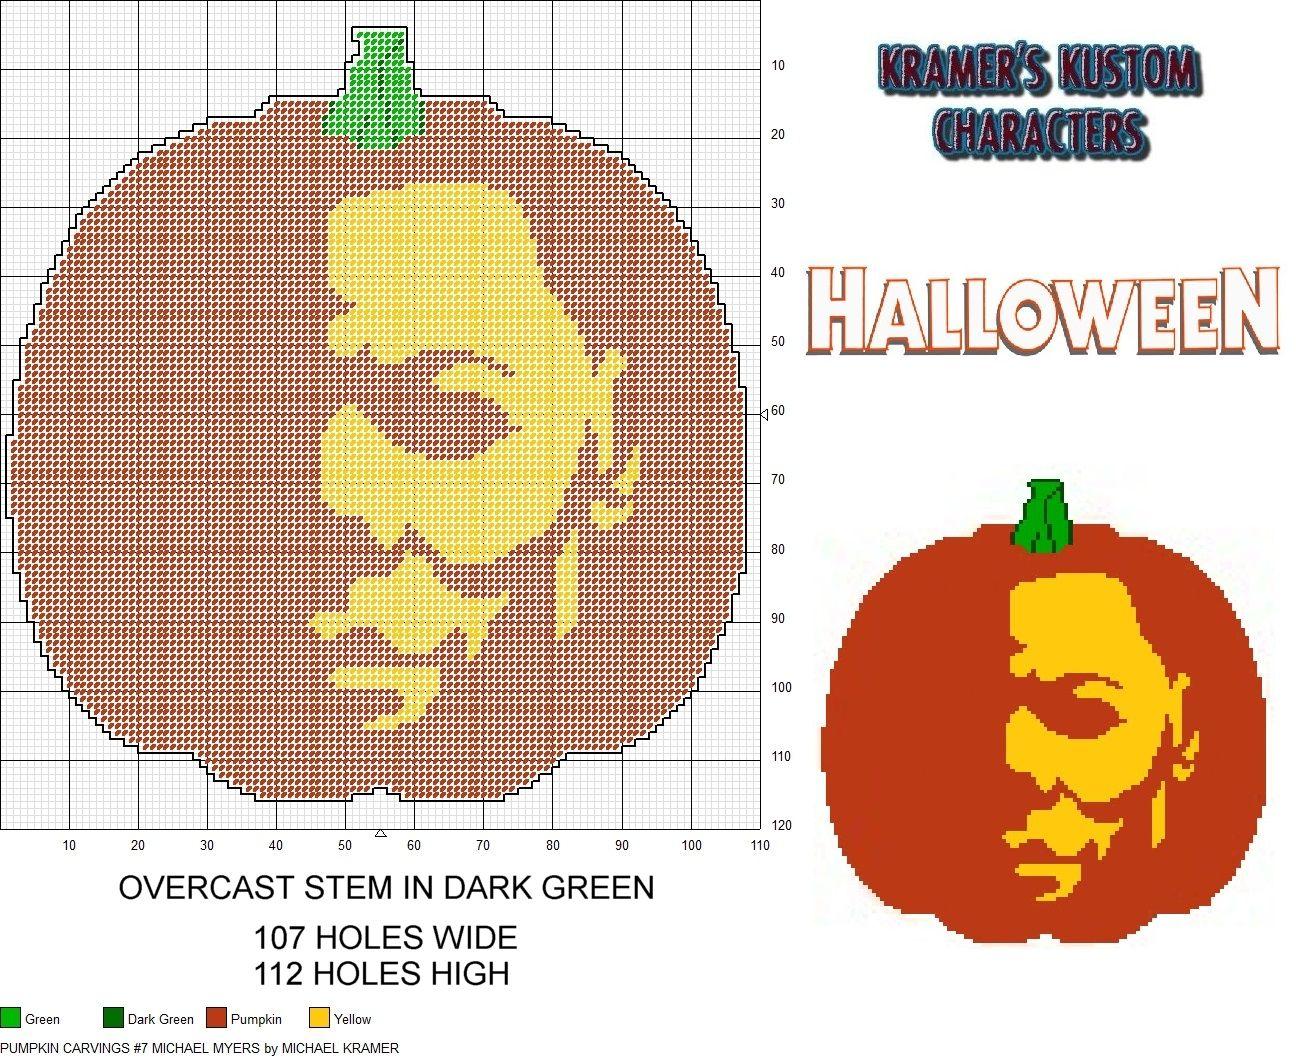 Pumpkin Carvings 7 Michael Myers plastic canvas pattern